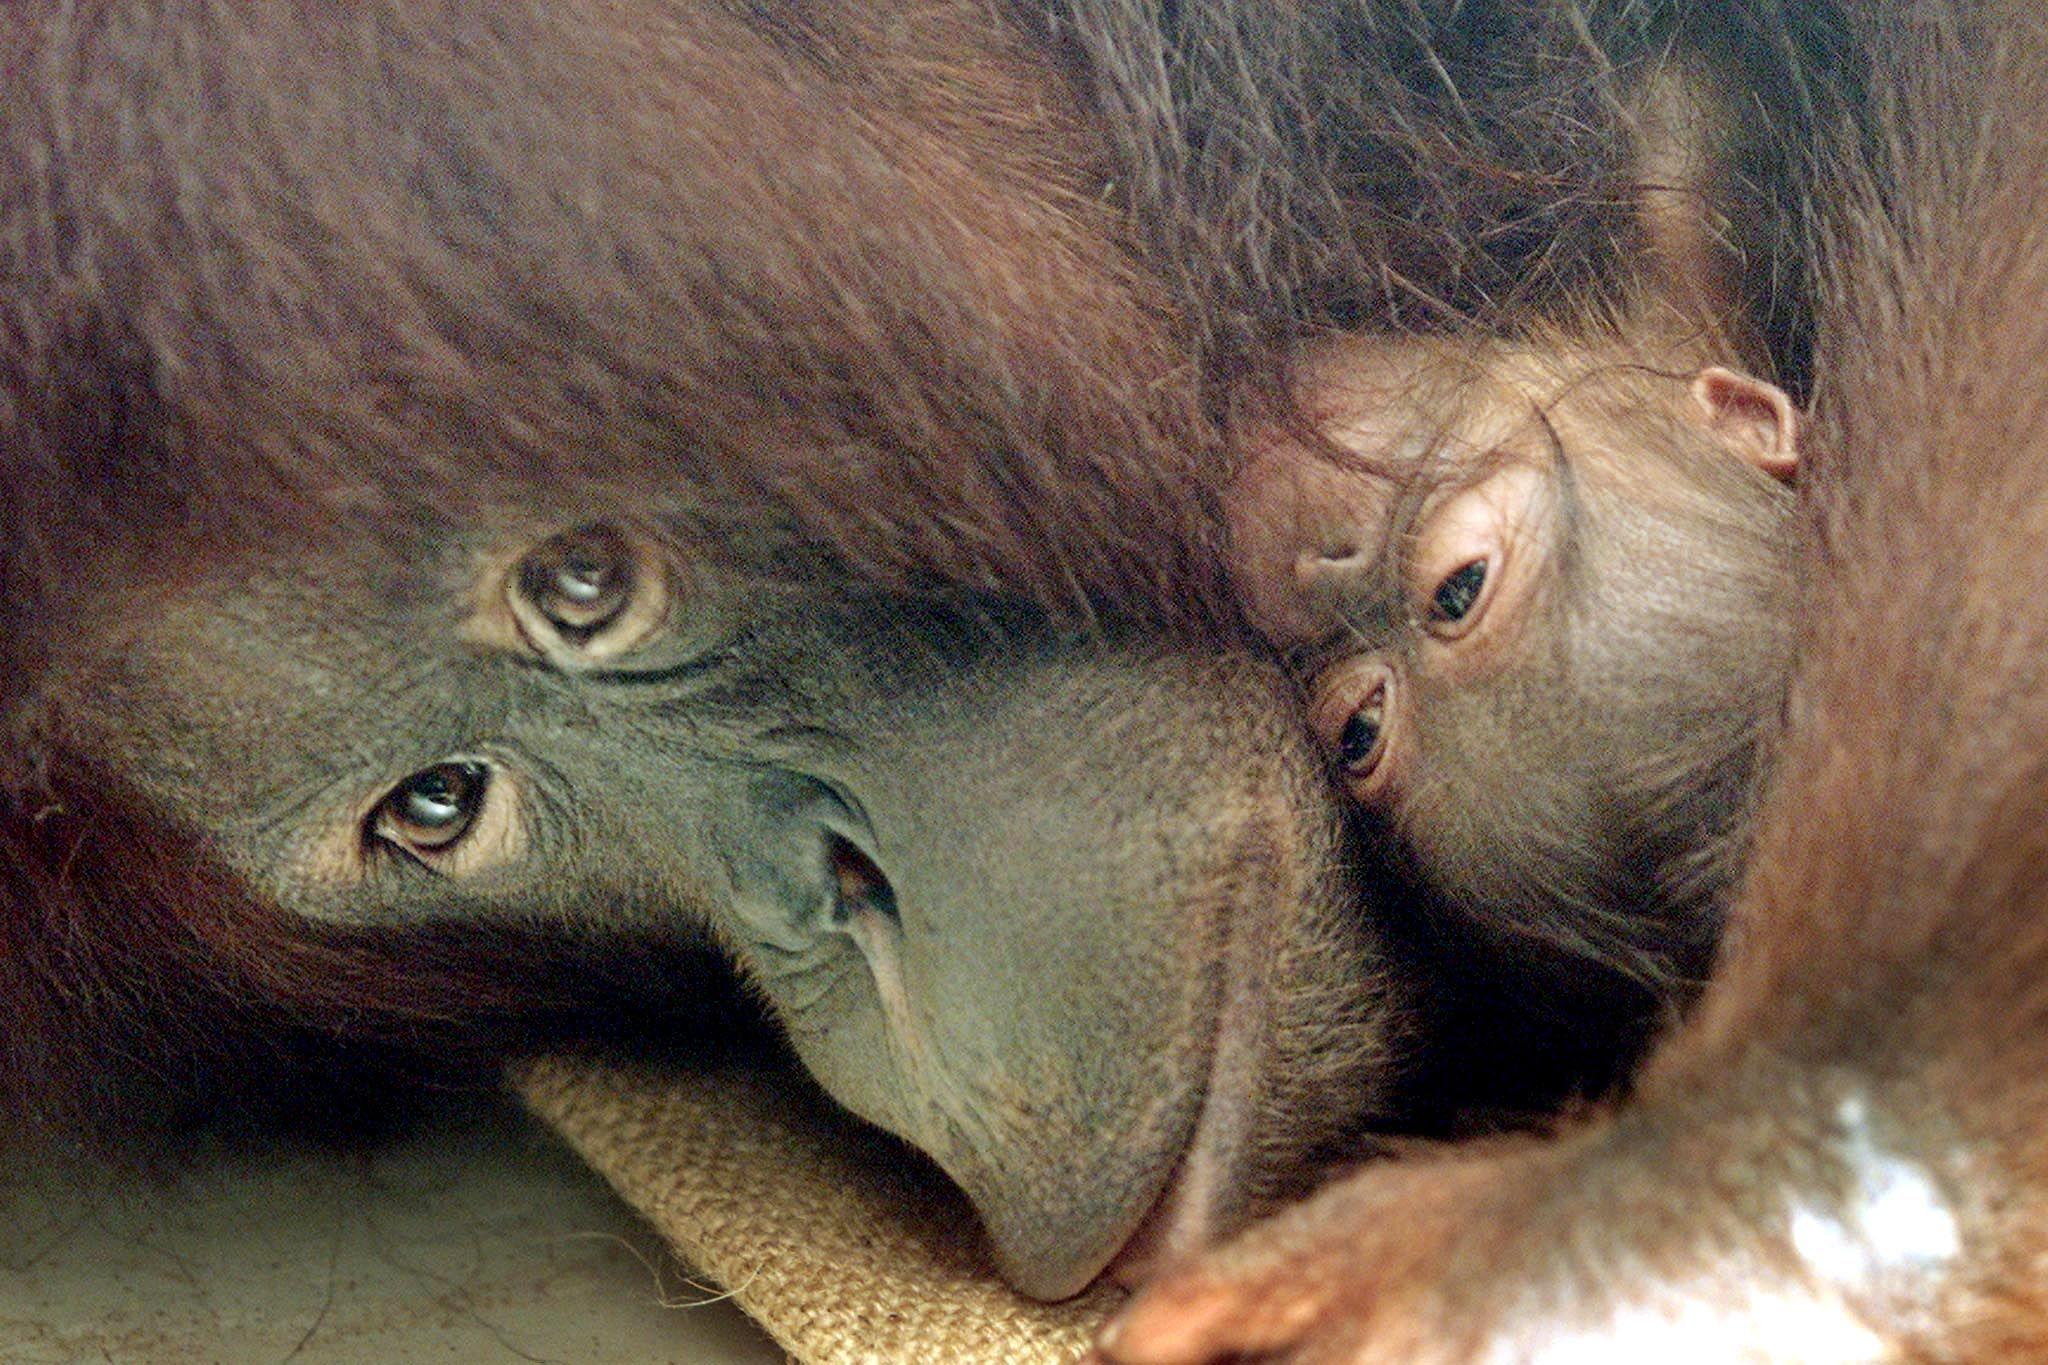 evolution of orangutans Orang-utans are the world's largest tree-climbing mammals while both species have shaggy reddish fur, sumatran orangutans have longer facial hair.